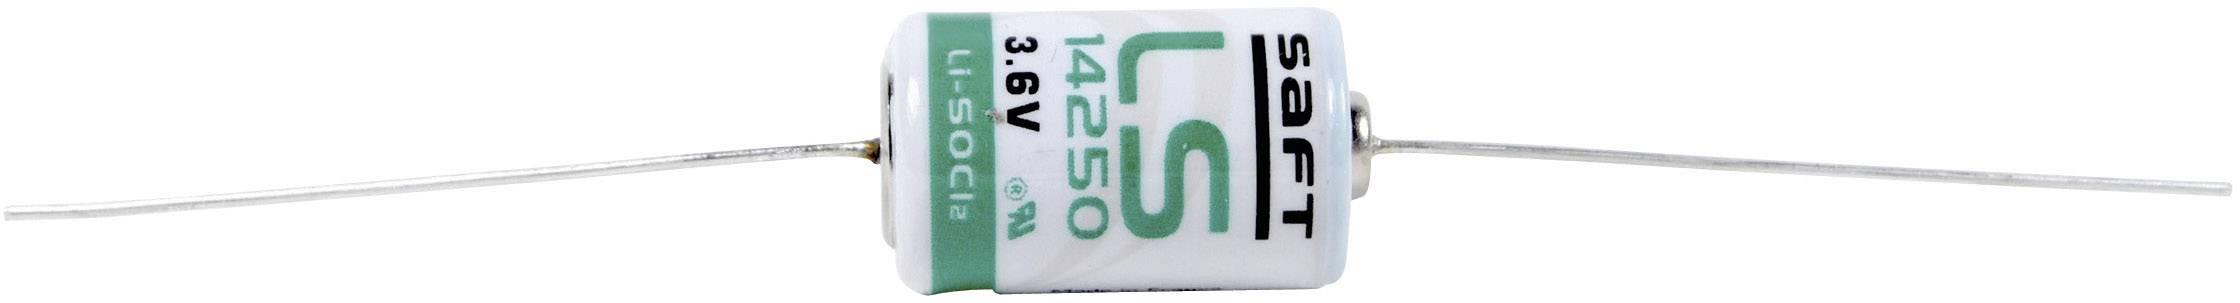 Špeciálny typ batérie 1/2 AA lítium, Saft LS 14250 CNA, 1200 mAh, 3.6 V, 1 ks